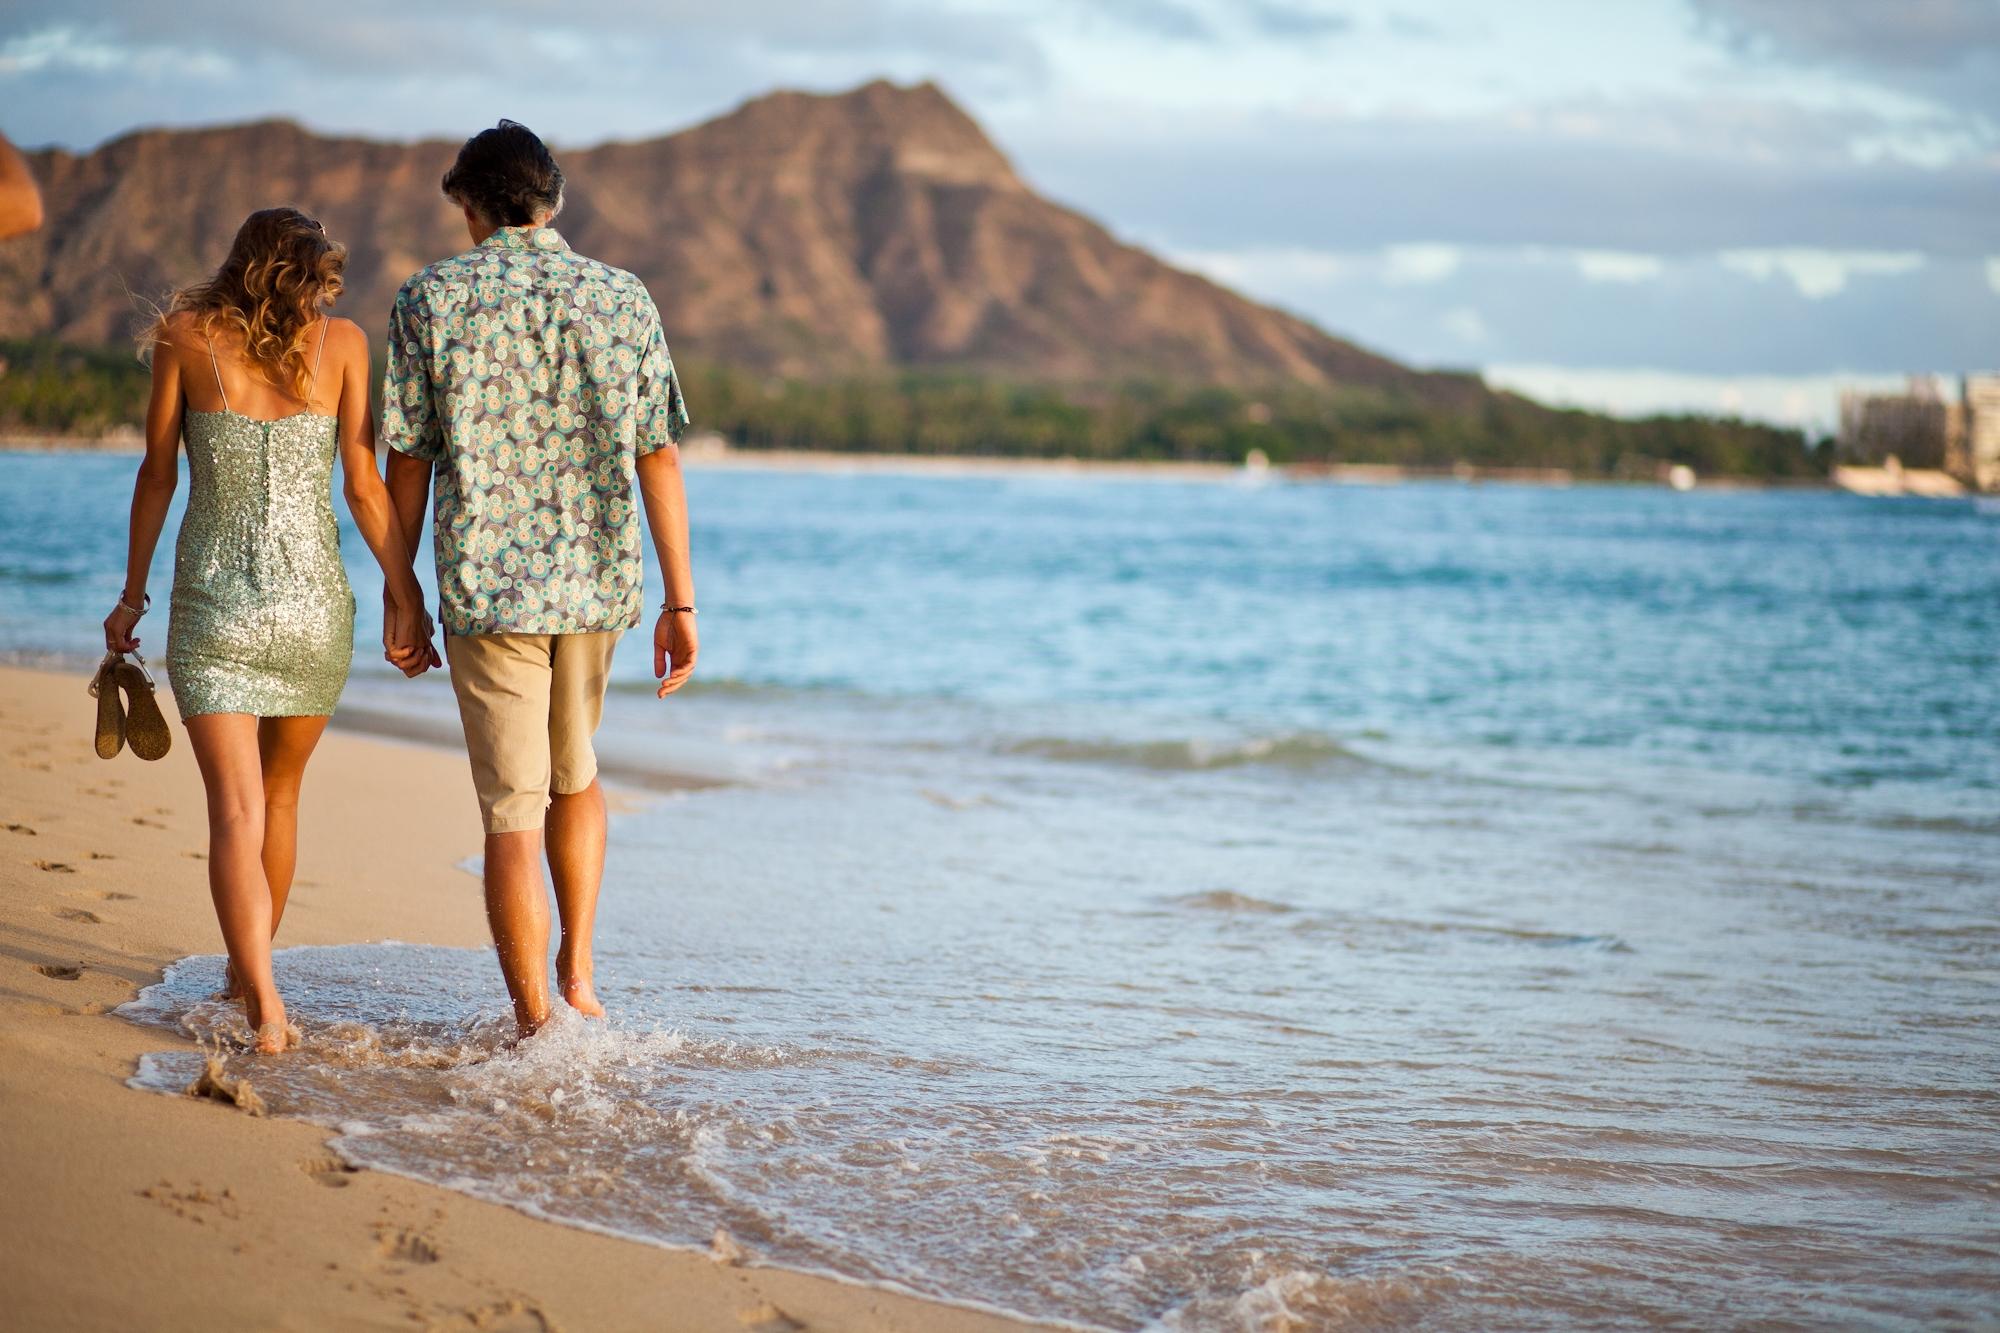 Hawaii-Tourism-Romantic-Stroll-2